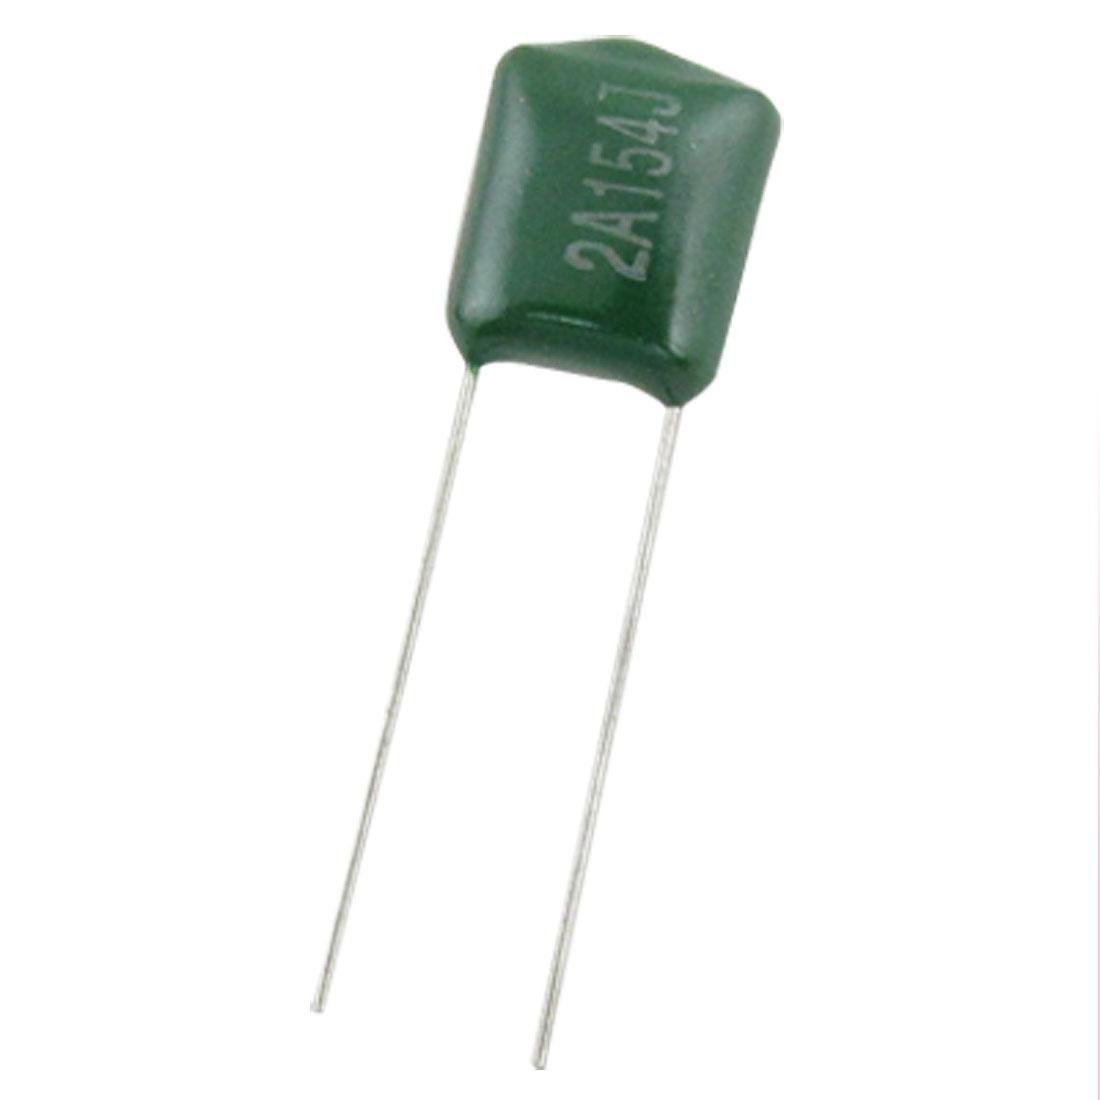 50 Pcs 100V 0.15uF 150nF 150000pF Polyester Film Capacitors